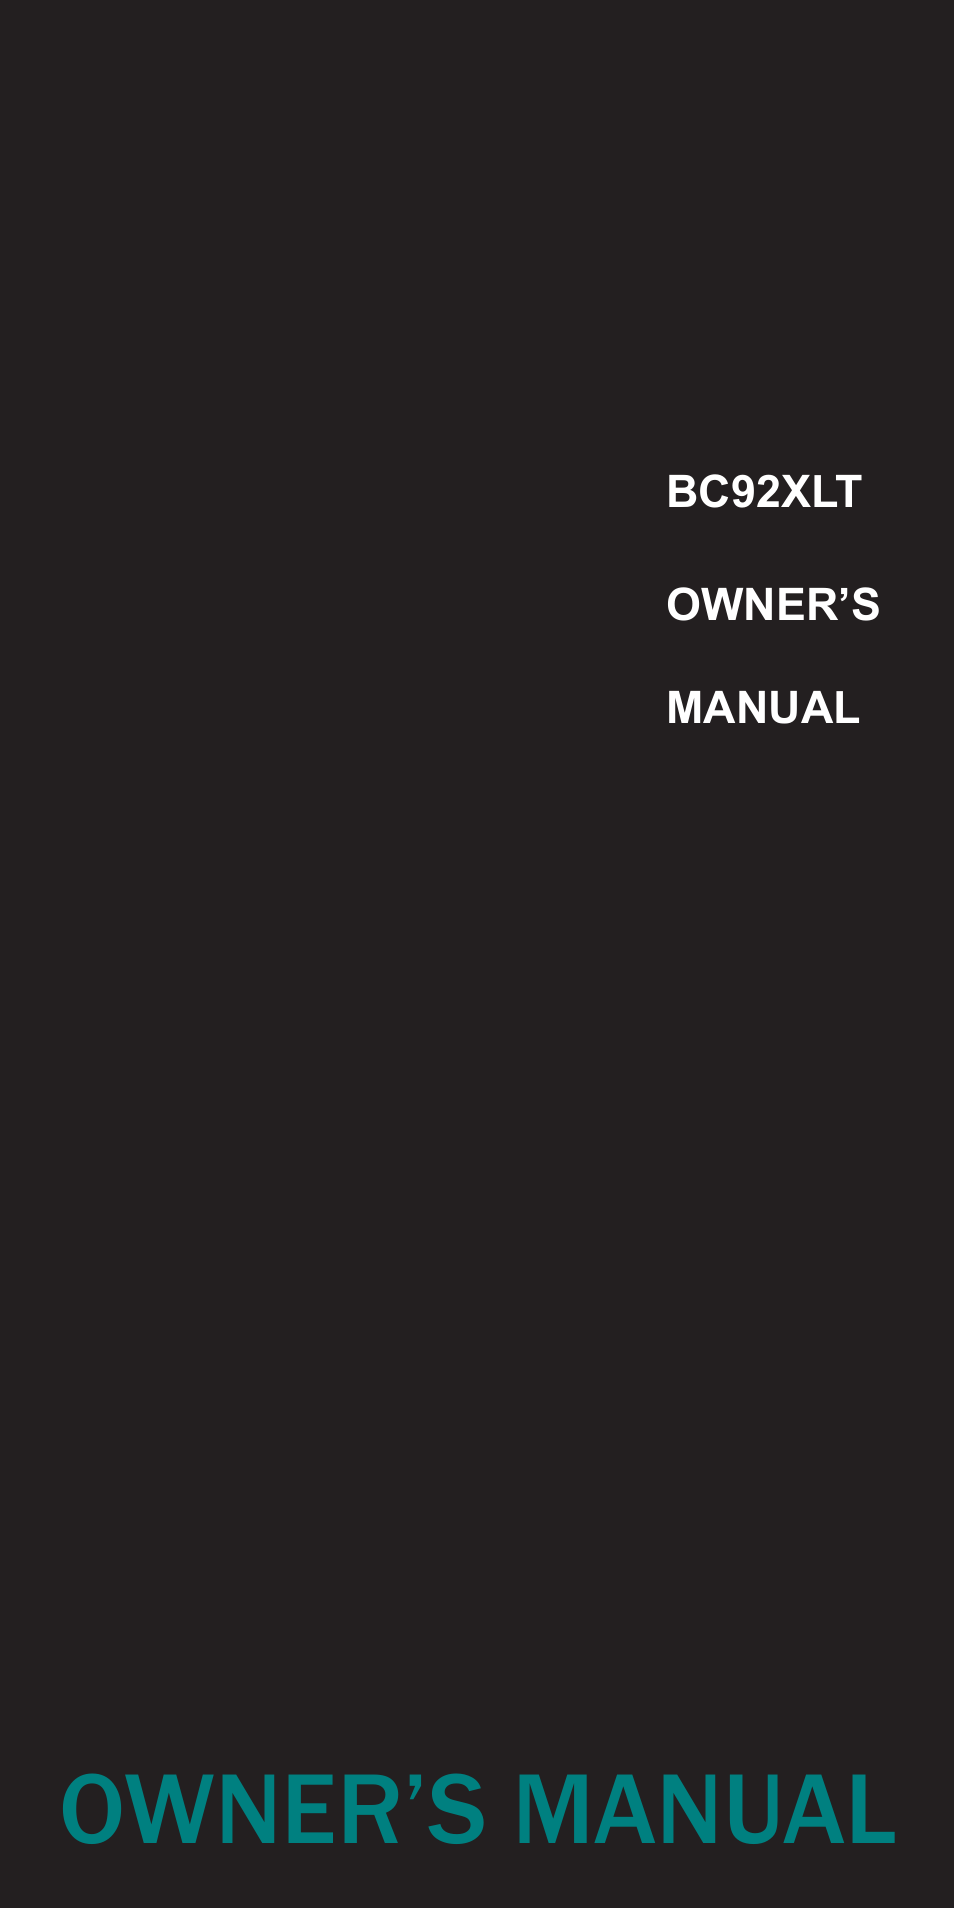 uniden bc92xlt user manual 64 pages rh manualsdir com Uniden 5.8 GHz Manual Uniden Digital DECT 6.0 Manual